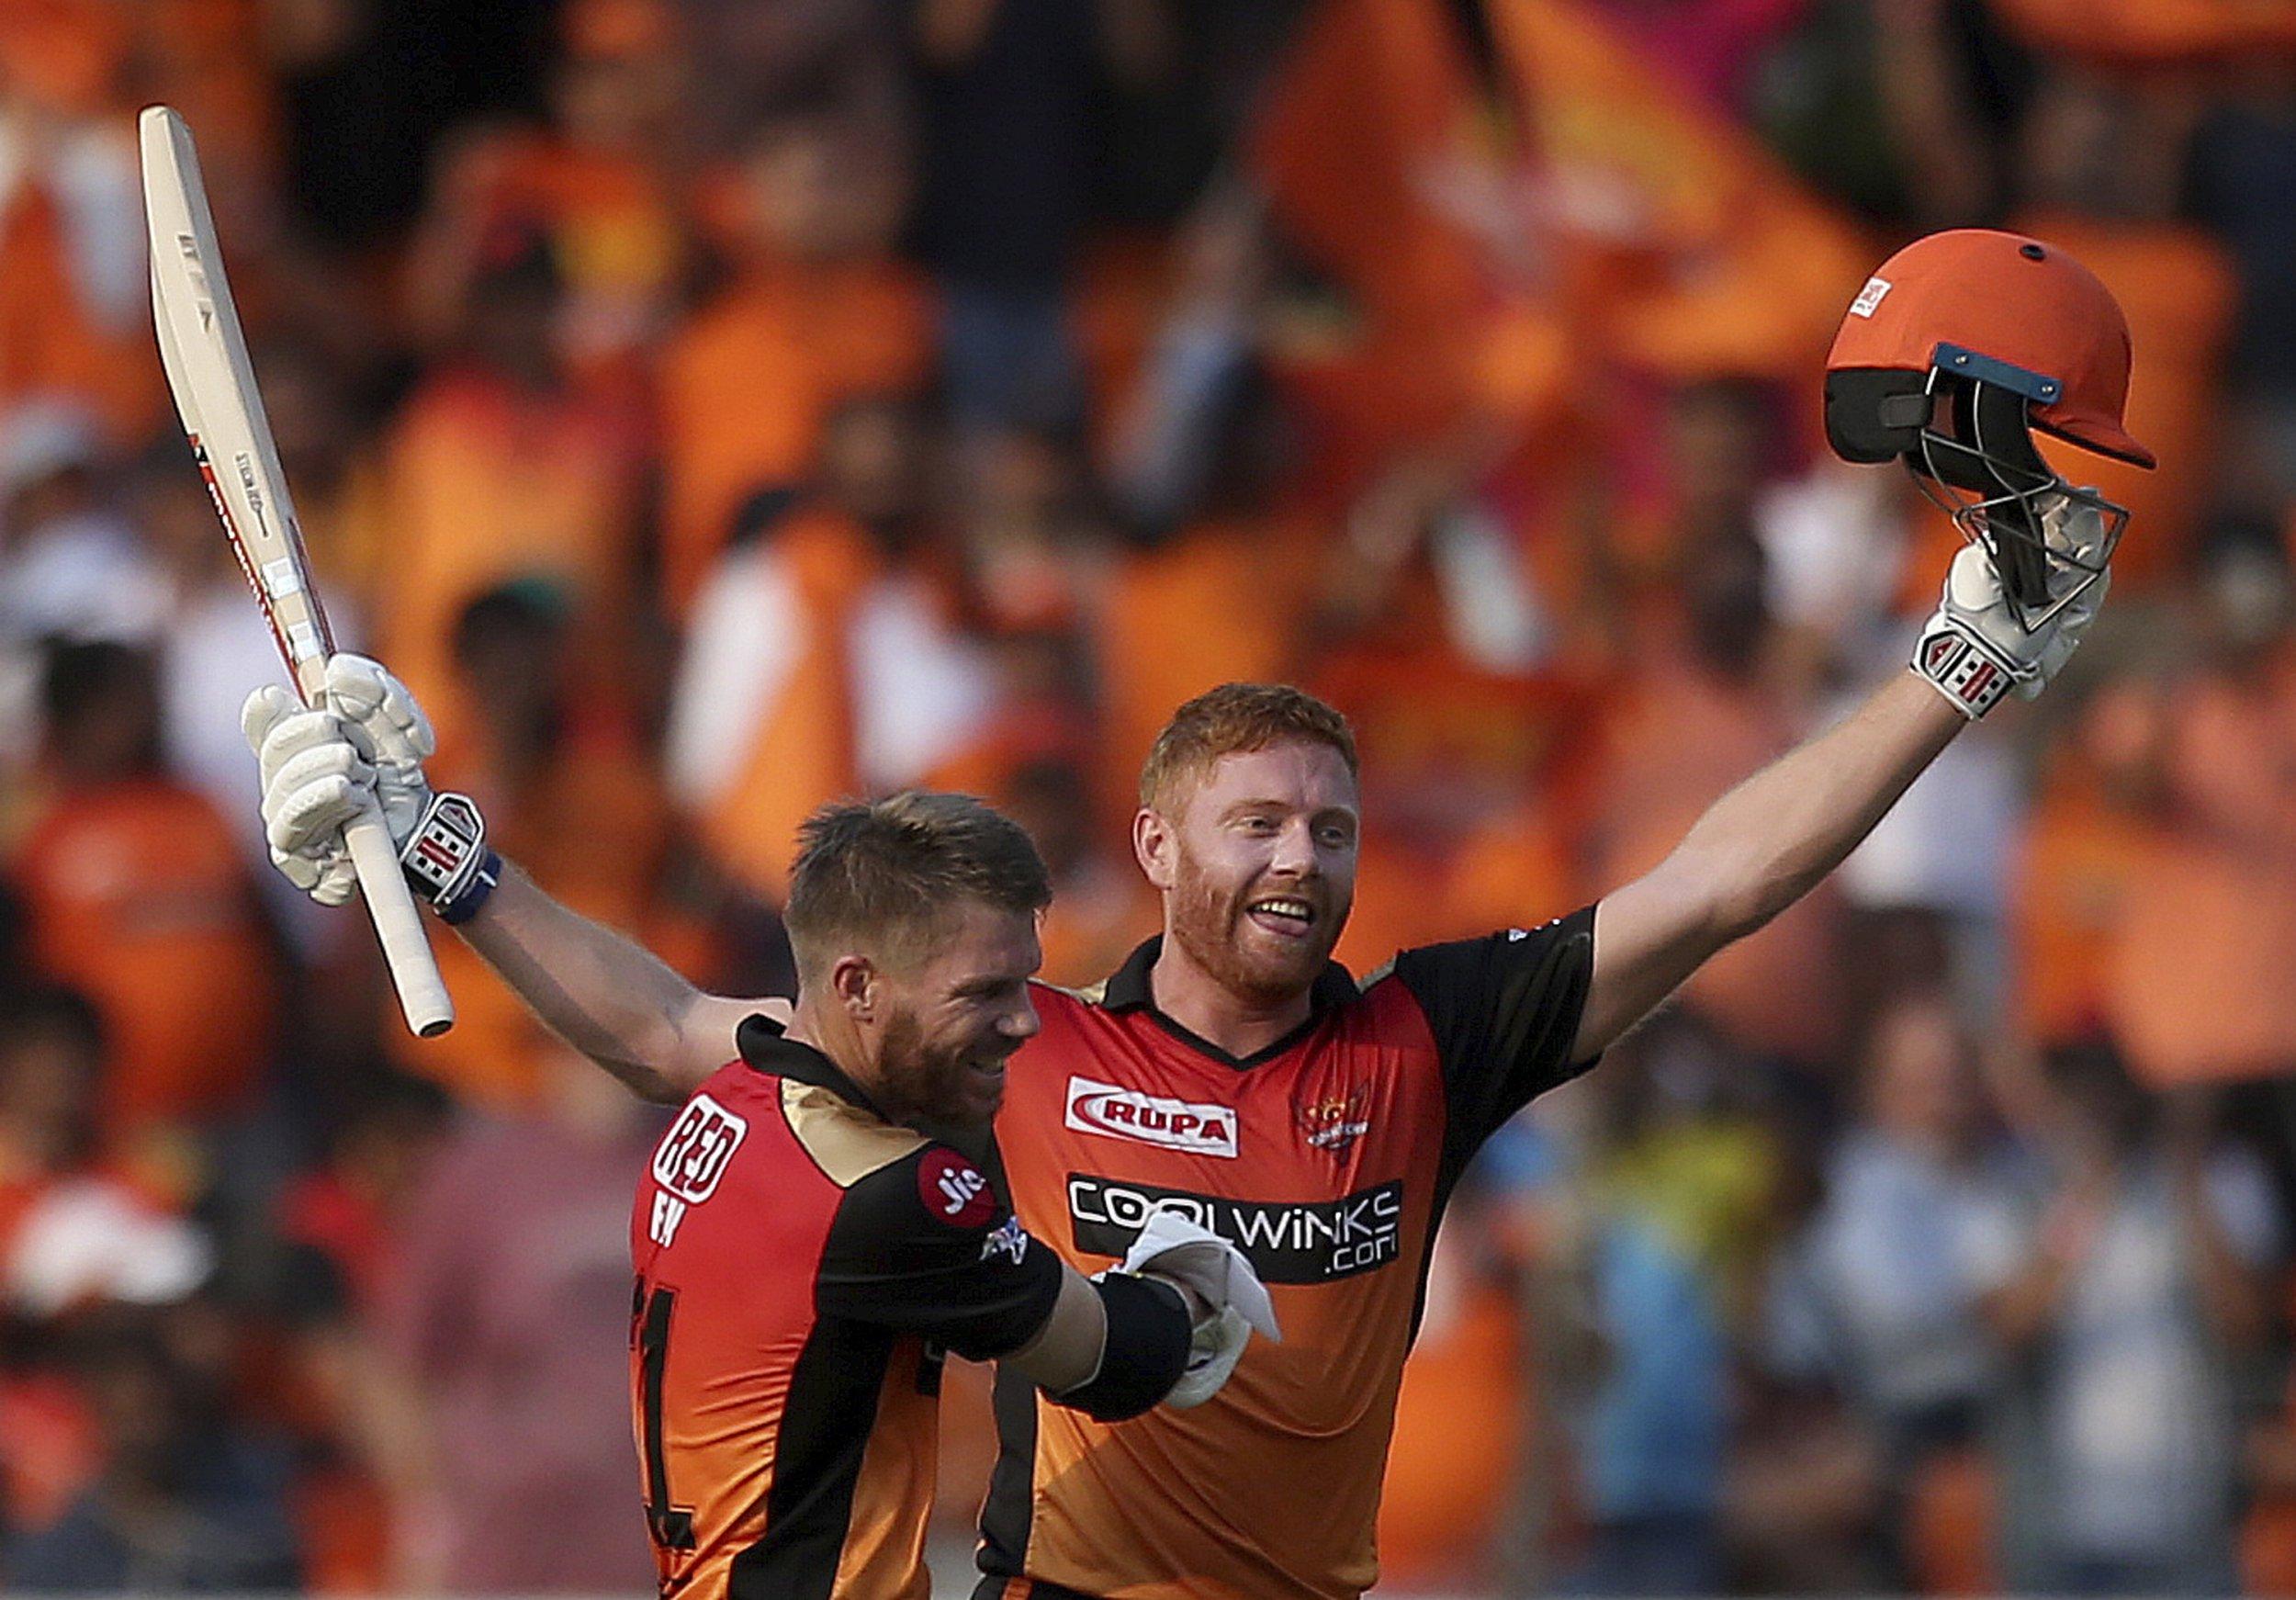 Virat Kohli hails 'world-class' Jonny Bairstow and David Warner after IPL masterclass